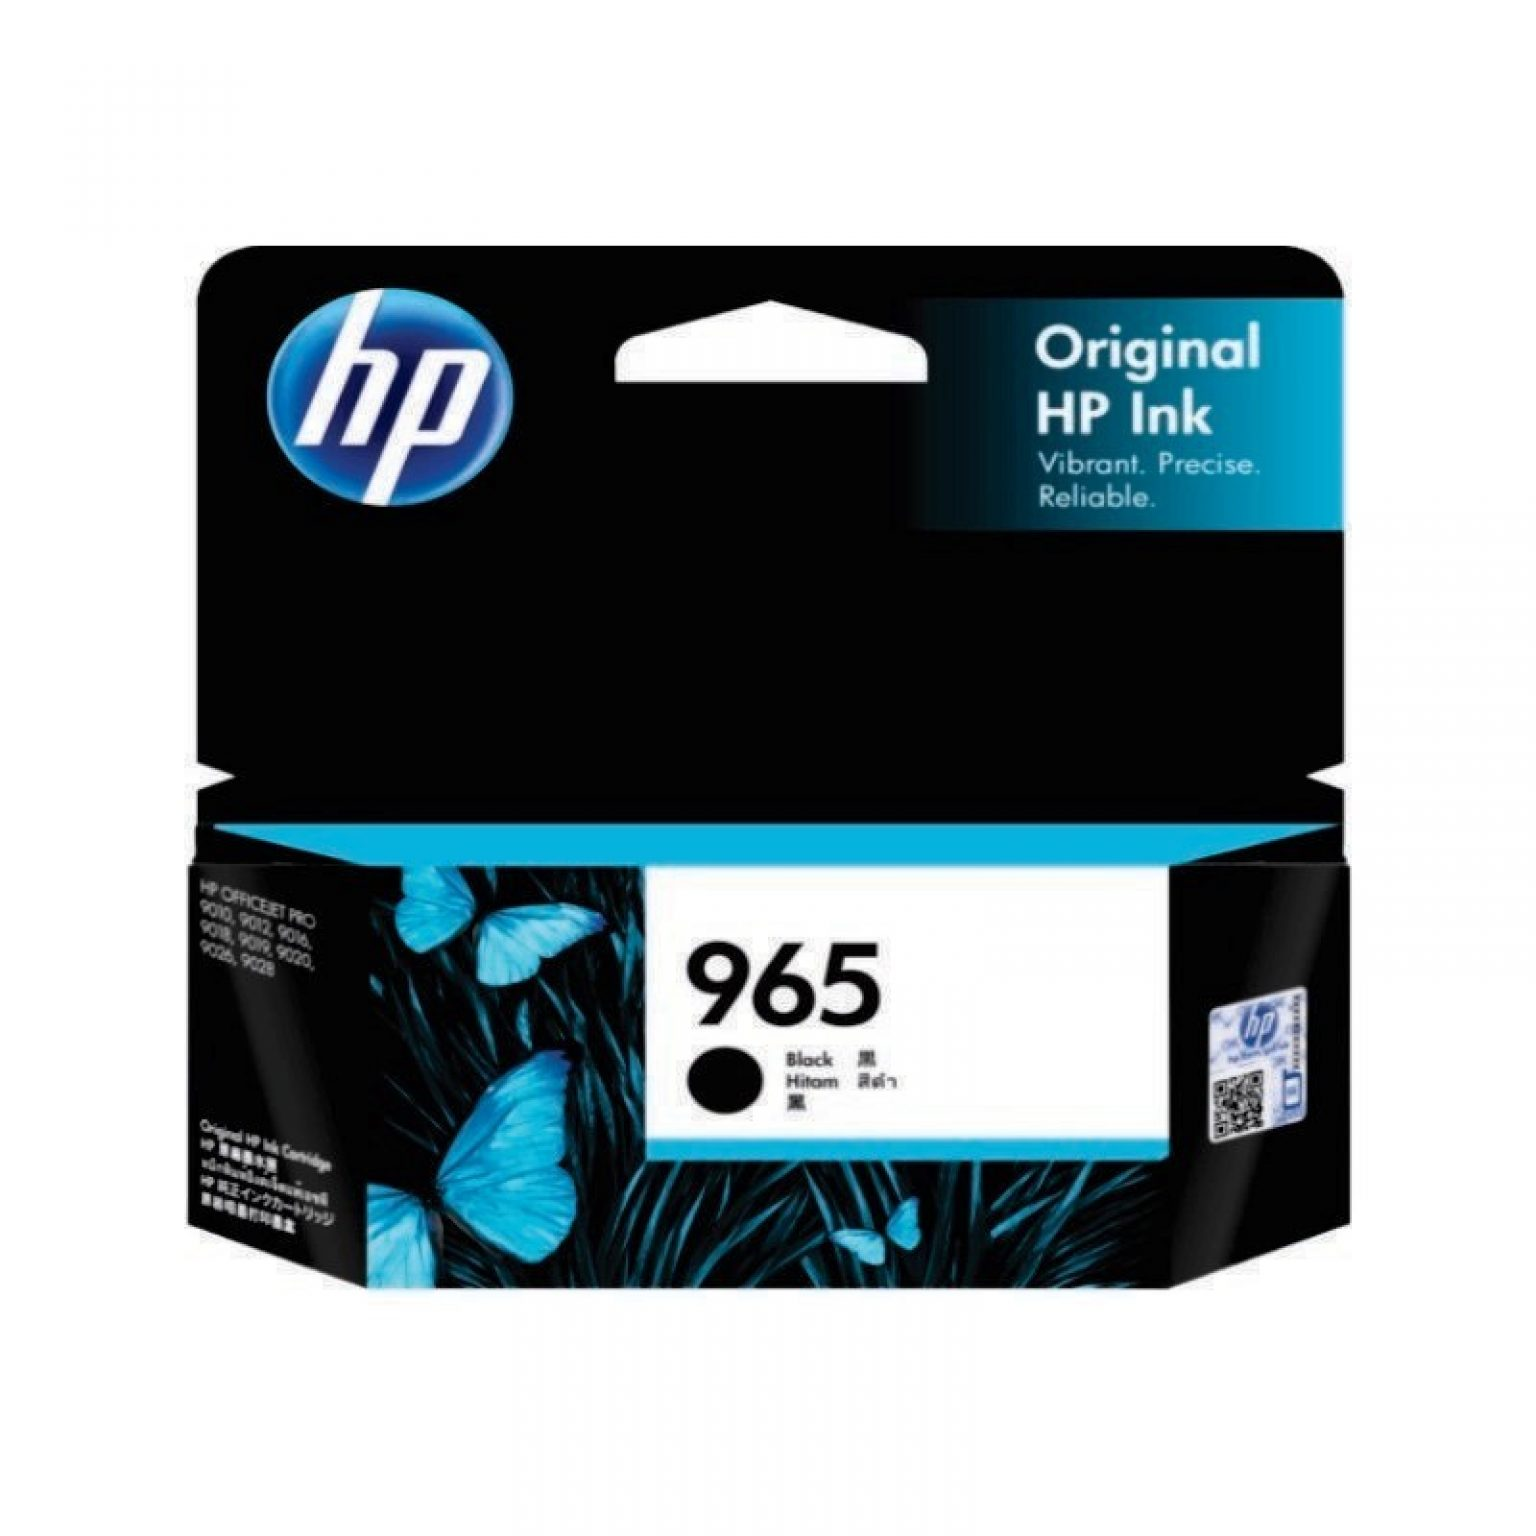 HP - 965 Black Original Ink Cartridge [3JA80AA]